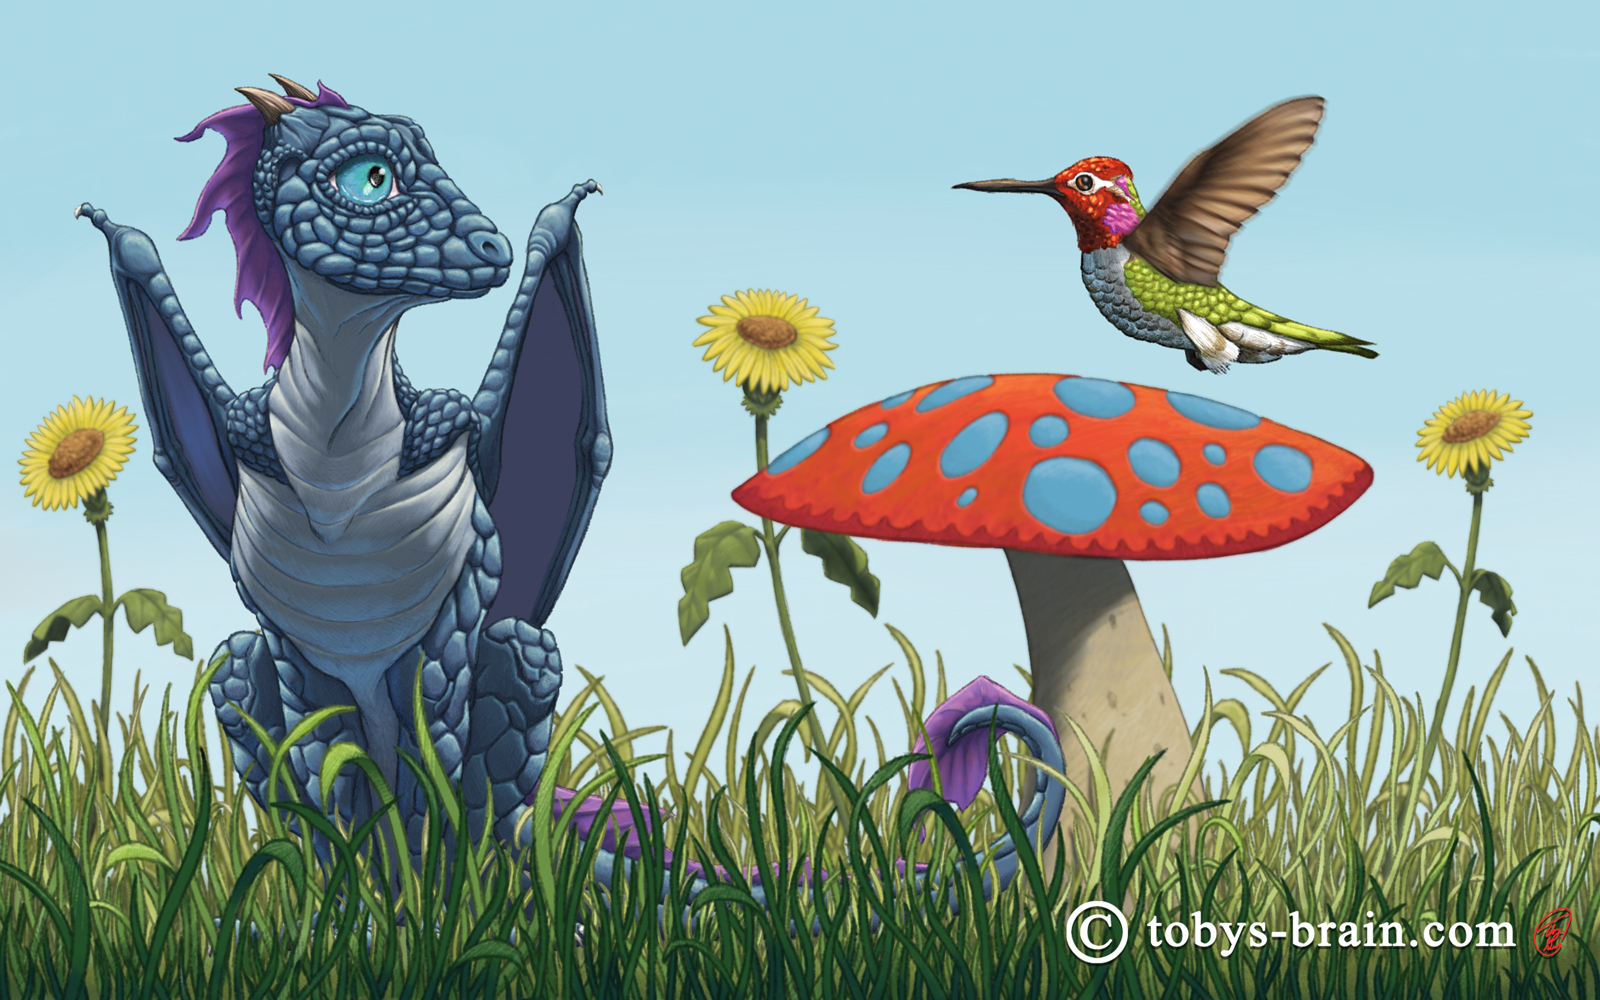 Dragon and Humming Bird